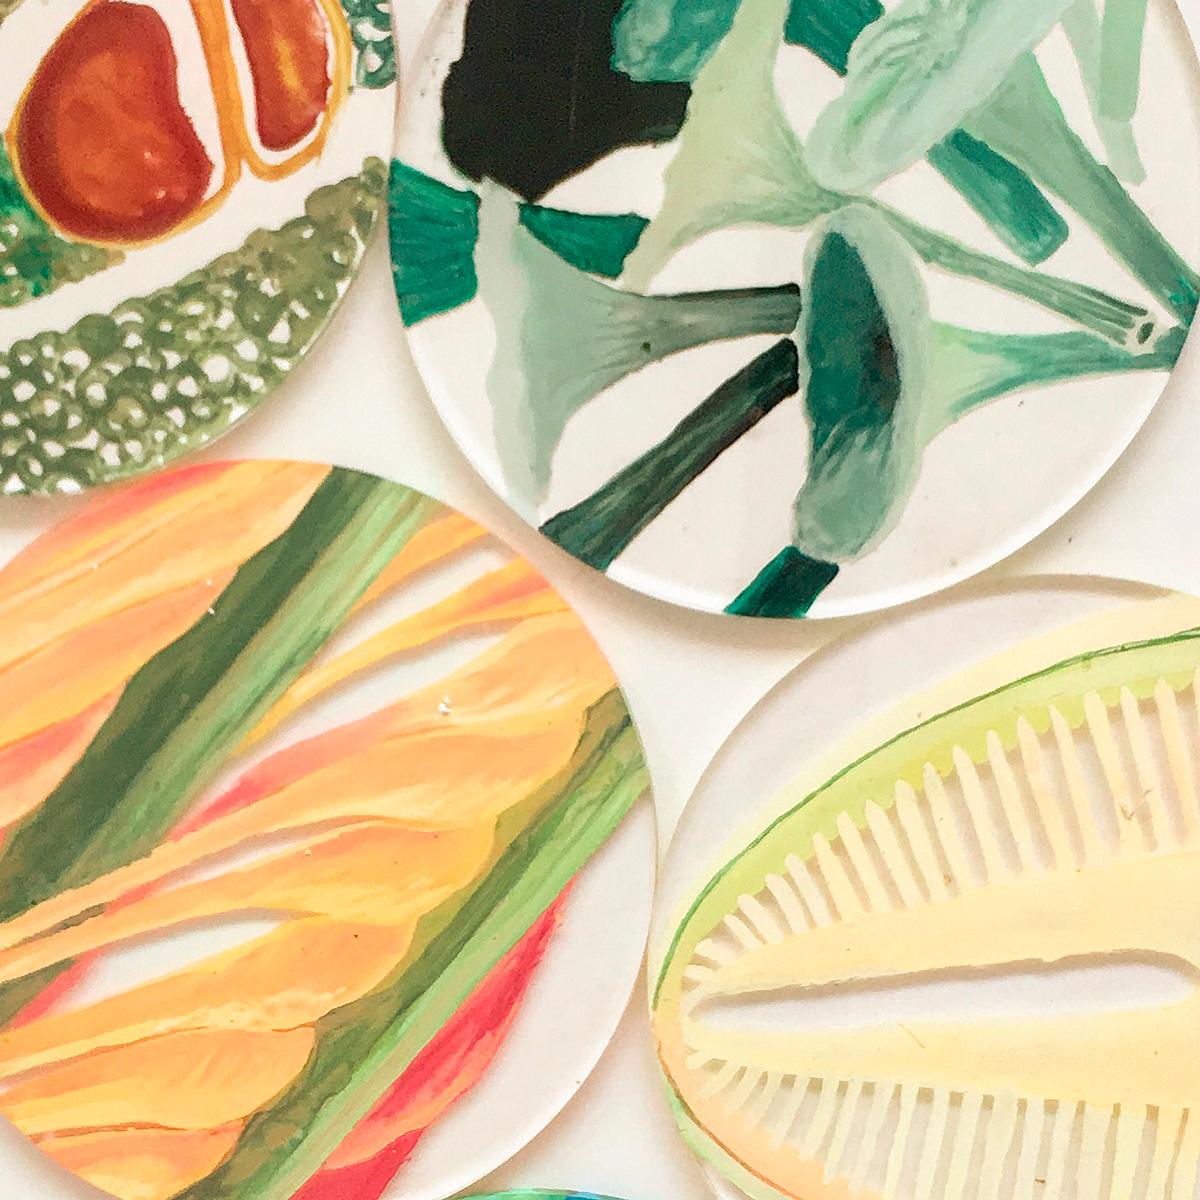 Caterina Aicardi, opere, scultura, natura, art, vetrini, piante, pittura